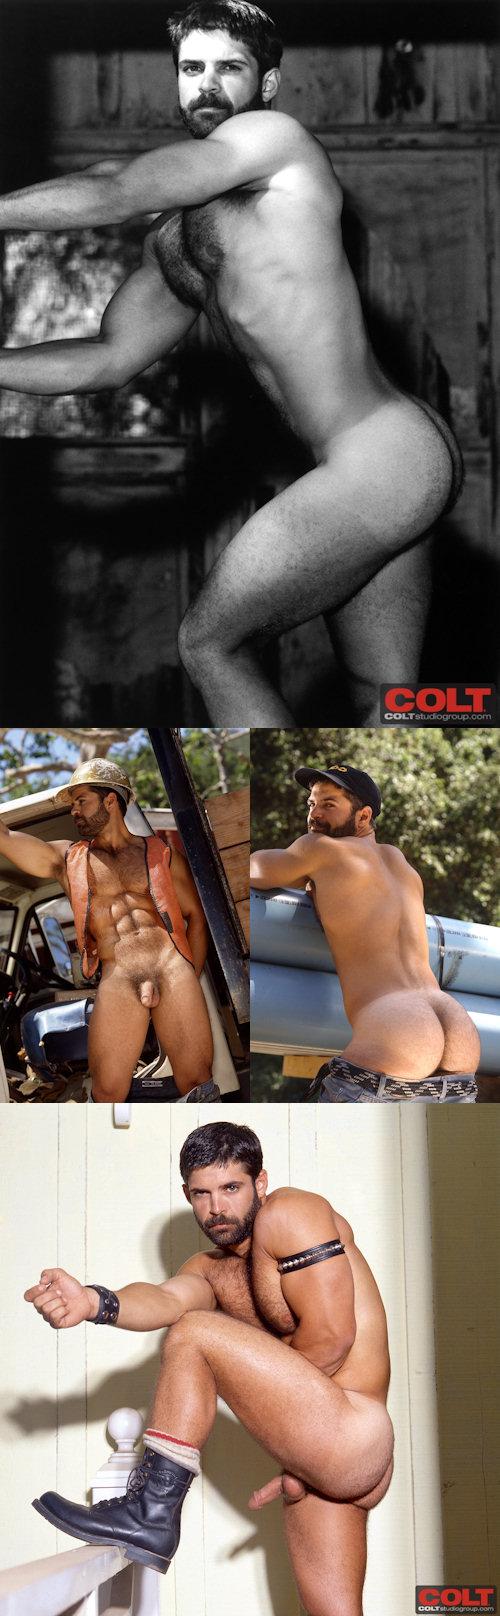 colt0113b.jpg